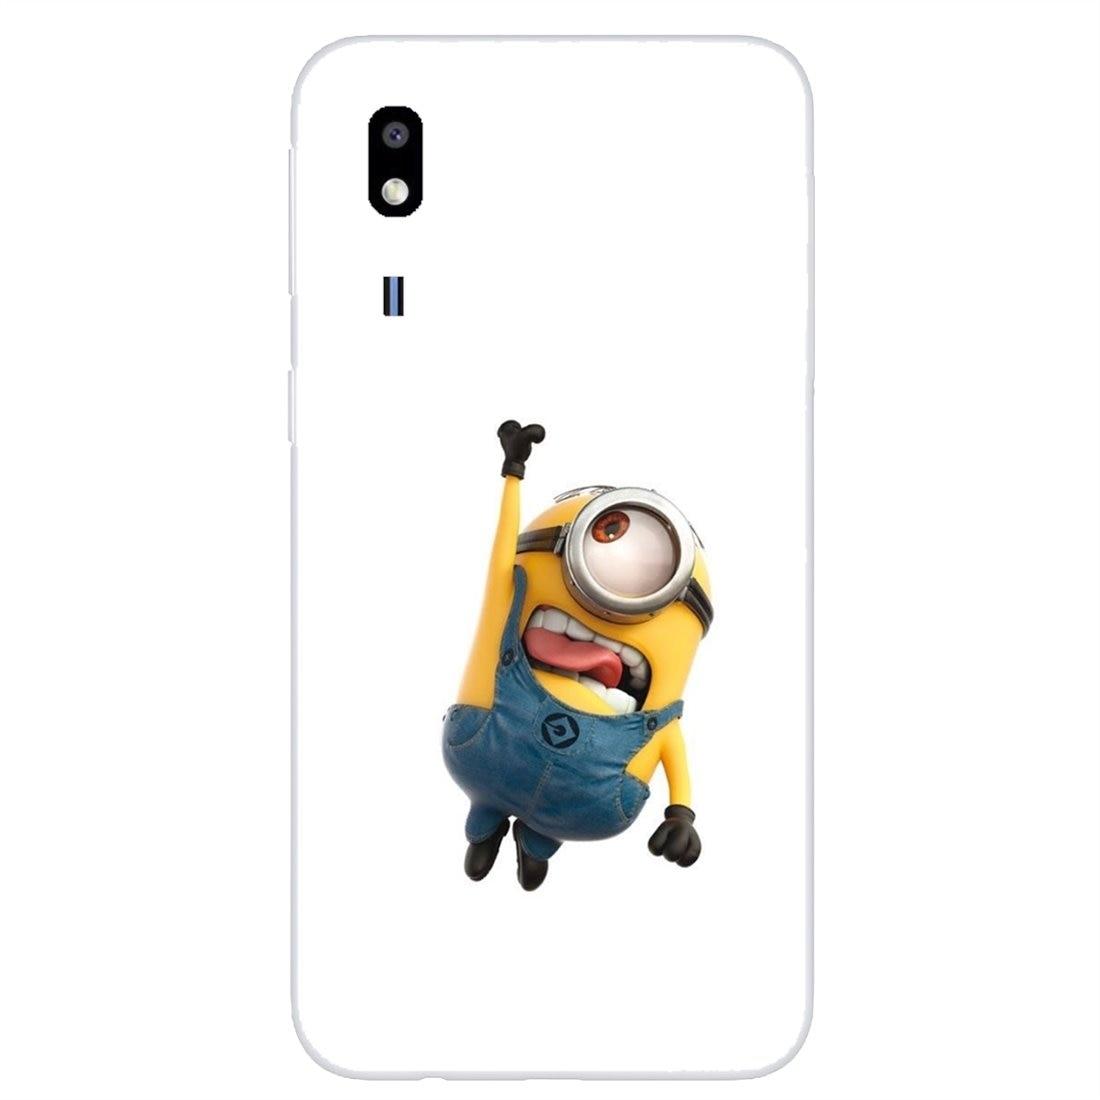 Despreciable Me 3 Minions amarillos comprar caja del teléfono de silicona para Xiaomi Redmi 4A 7A S2 Nota 8 3S 3S 4 4X4 5X5 6 Plus 7 6A Pro teléfono móvil F1